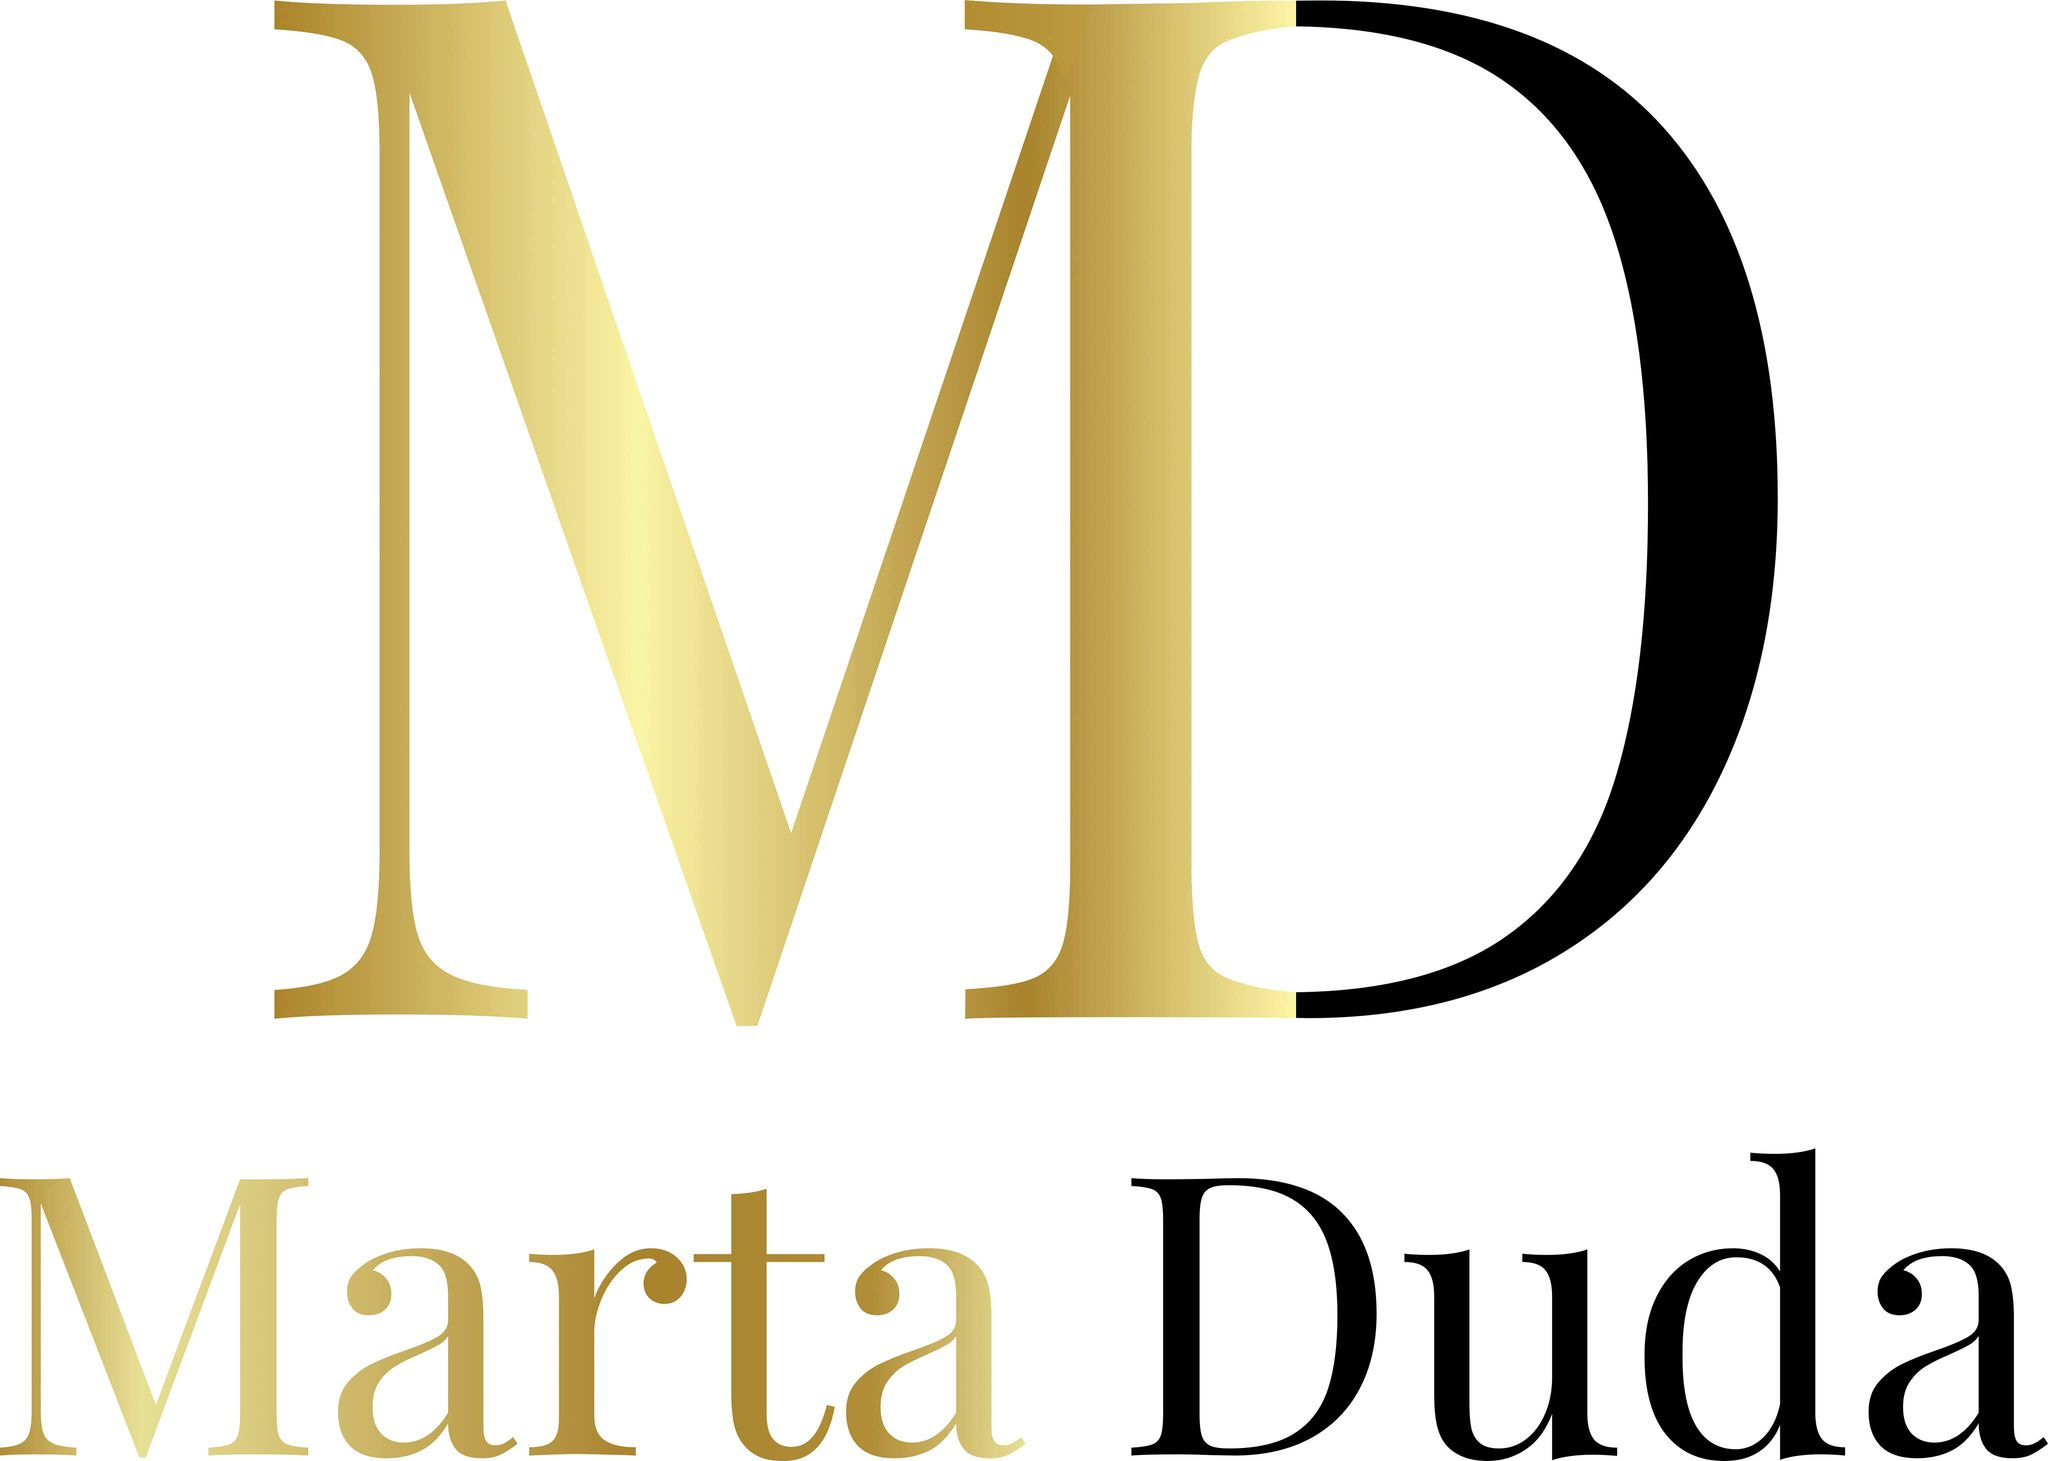 Marta Duda - Mentor of Impactful Female Entrepreneurs